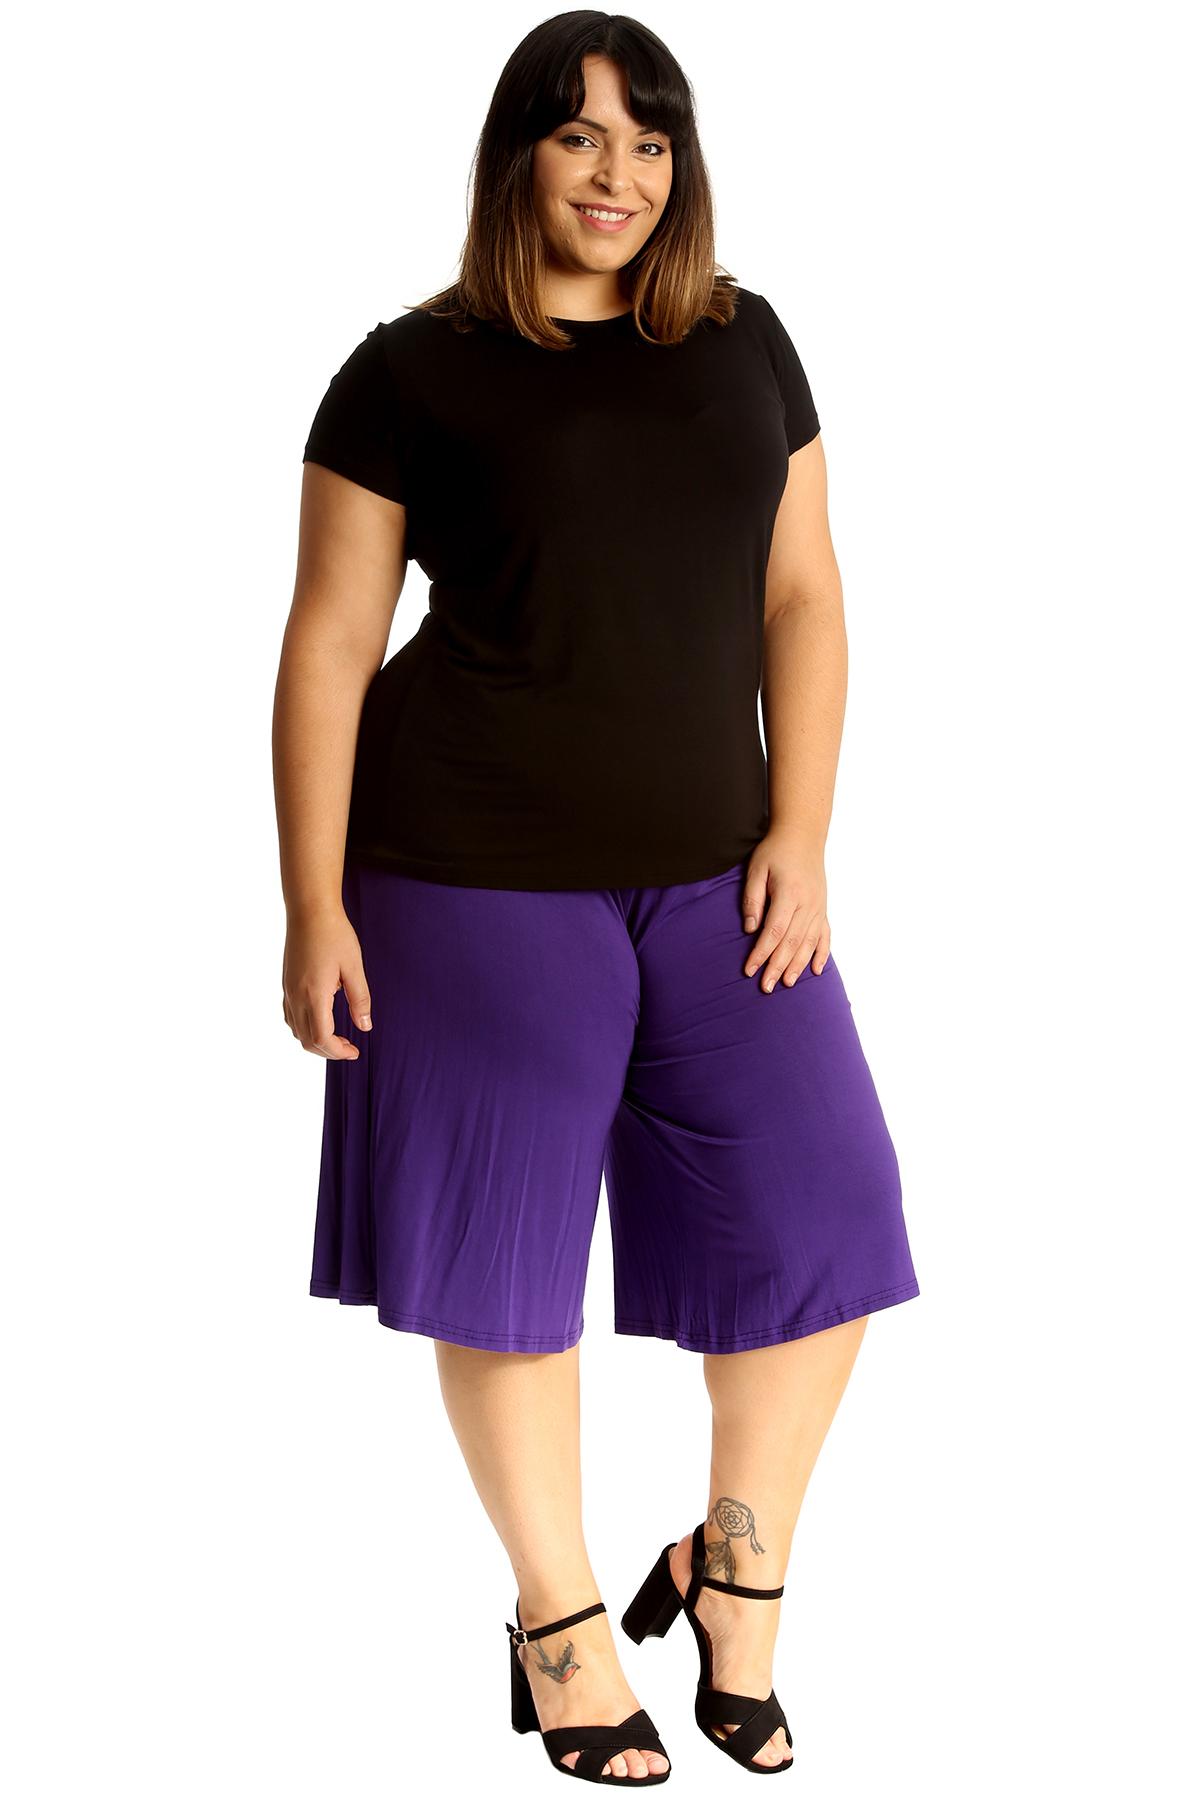 New-Womens-Plus-Size-Culottes-Ladies-Plain-Shorts-Palazzo-Elastic-Pants-Summer thumbnail 30